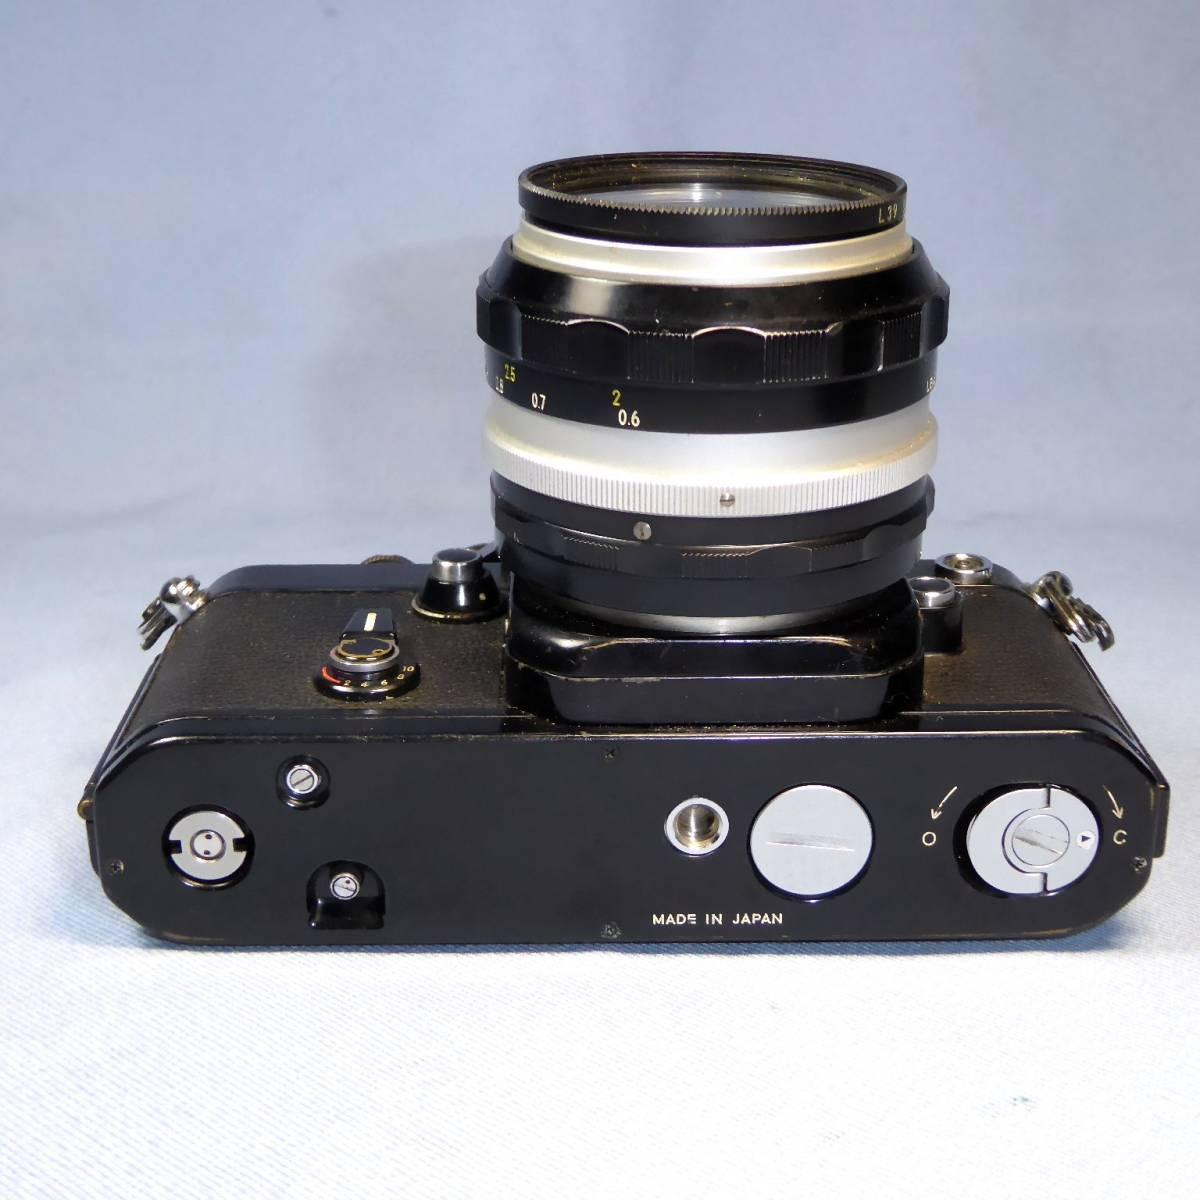 ★  NIKON      F 2   BL    +    AS ファインダー  +   NIKKOR-S  AUTO   50mm/F1.4 _画像6